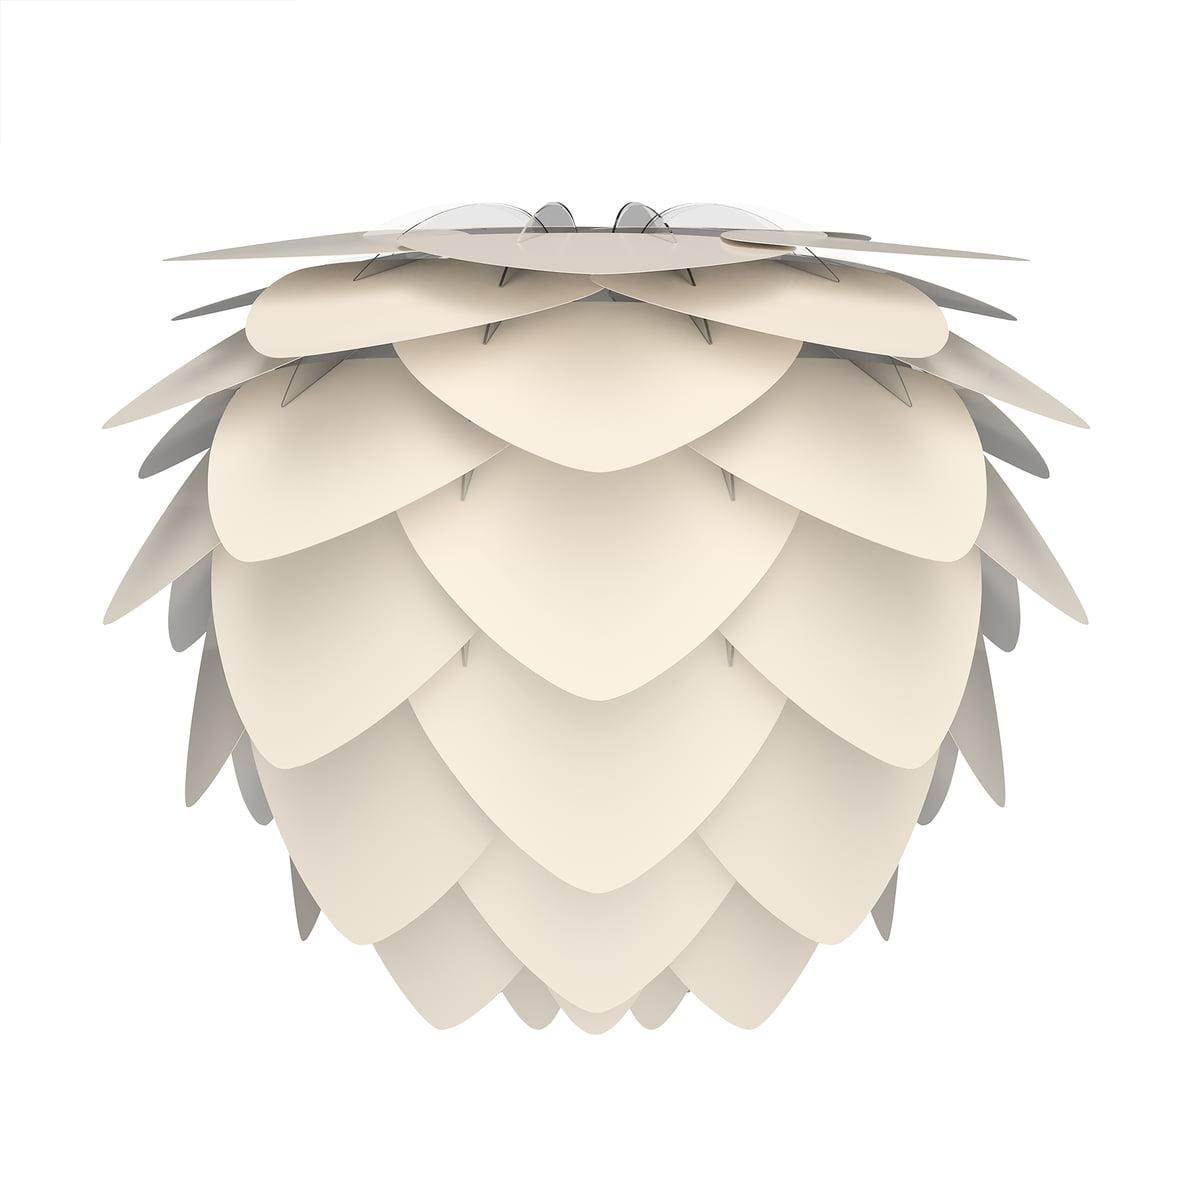 Umage - Aluvia Lampenschirm medium, Ø 59 cm / pearl | Lampen | Créme | Aluminium -  polypropylen -  polycarbonat | Umage